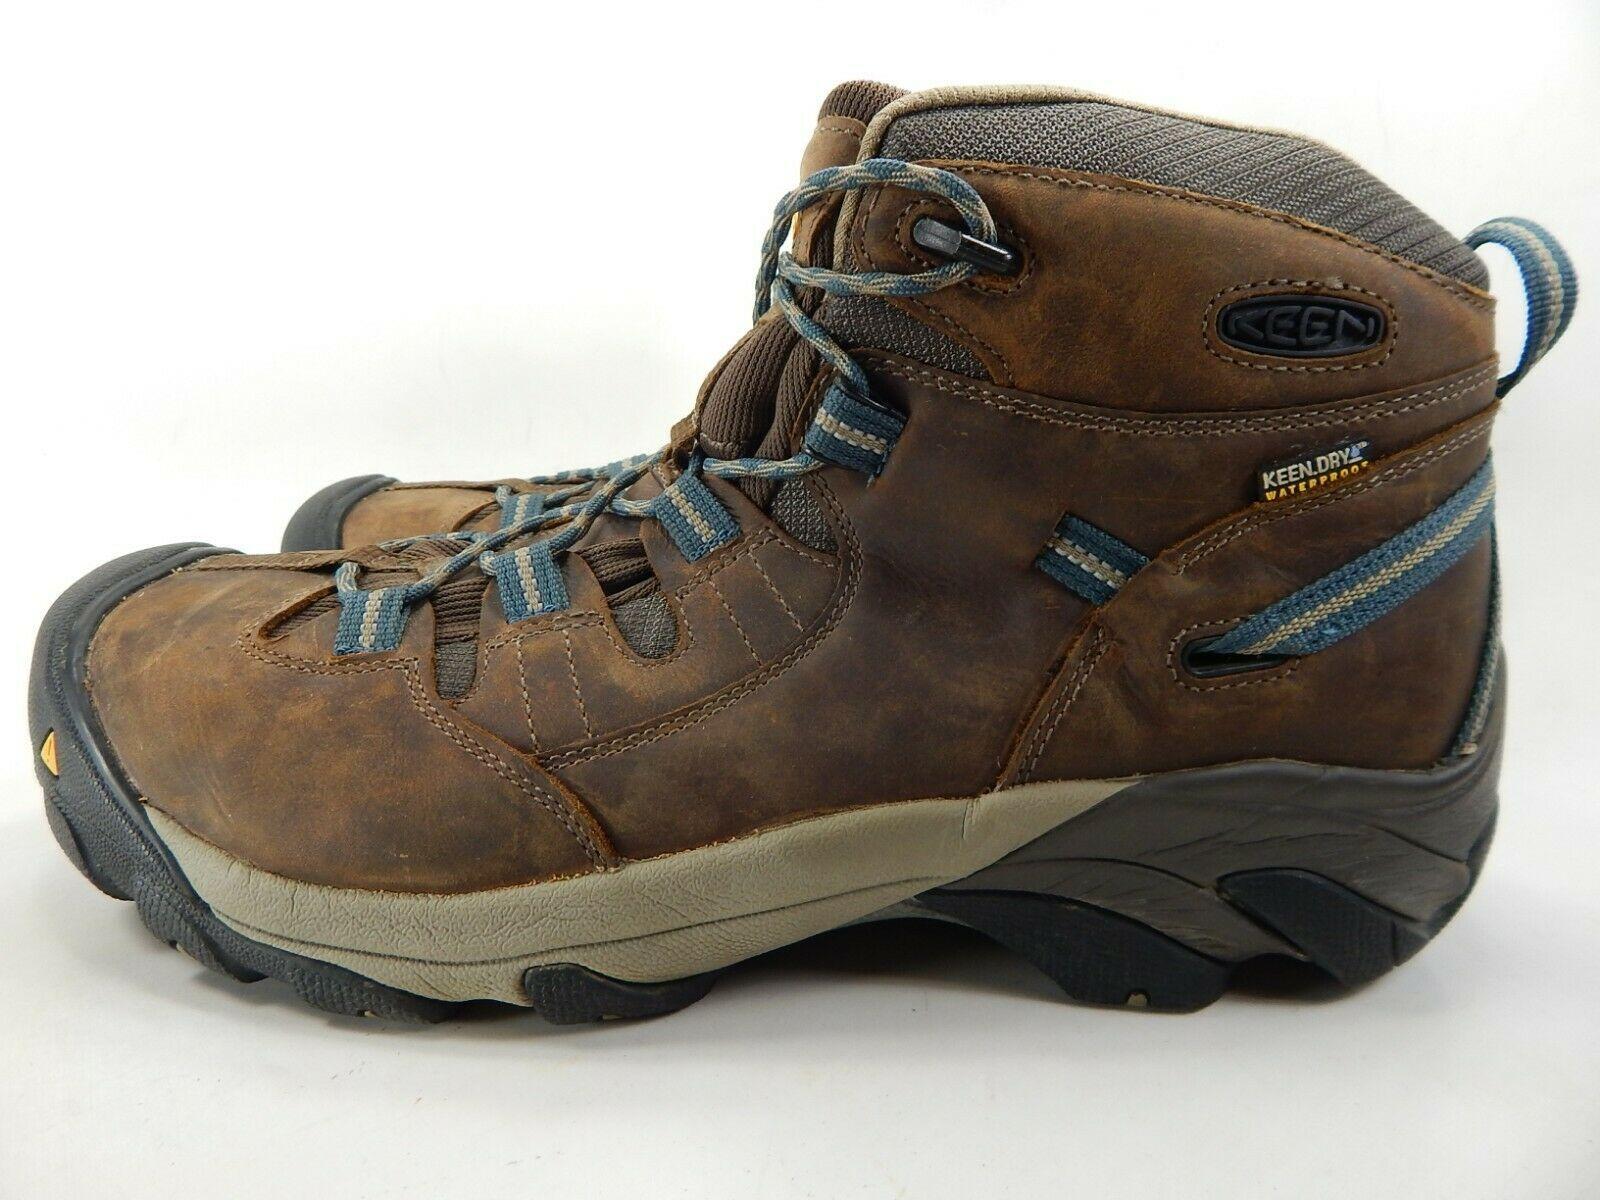 Keen Detroit Mid Size 13 M (D) EU 47 Men's Steel Toe Work Boots Brown 1007004